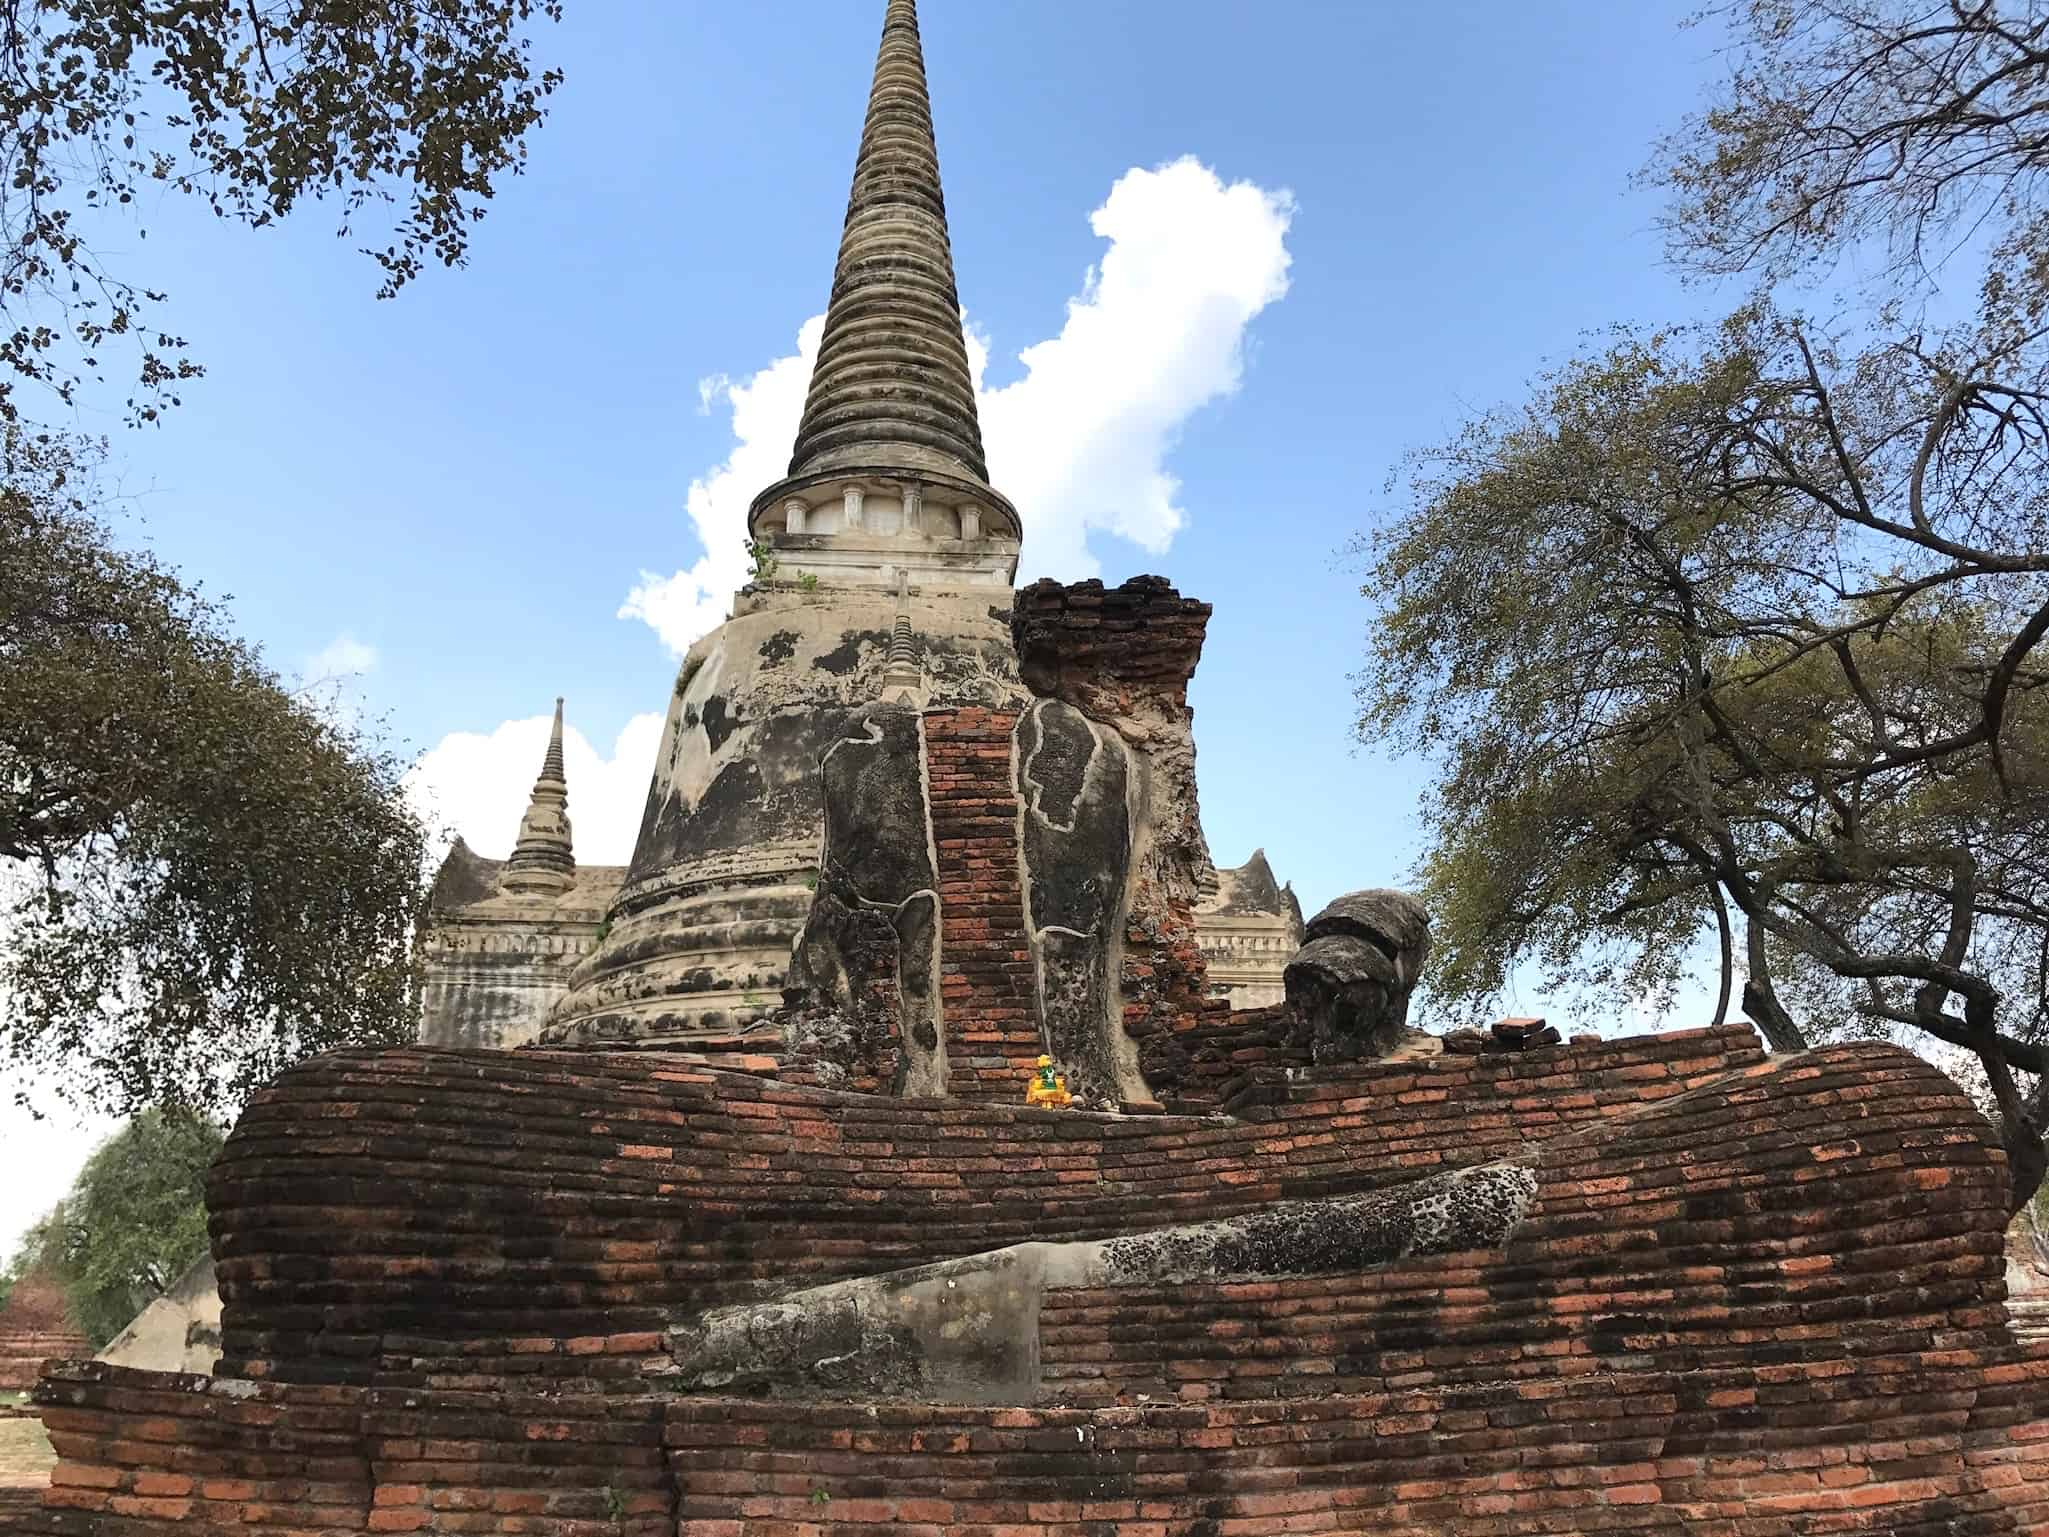 Wat Phra Sri Sanphet Buddha